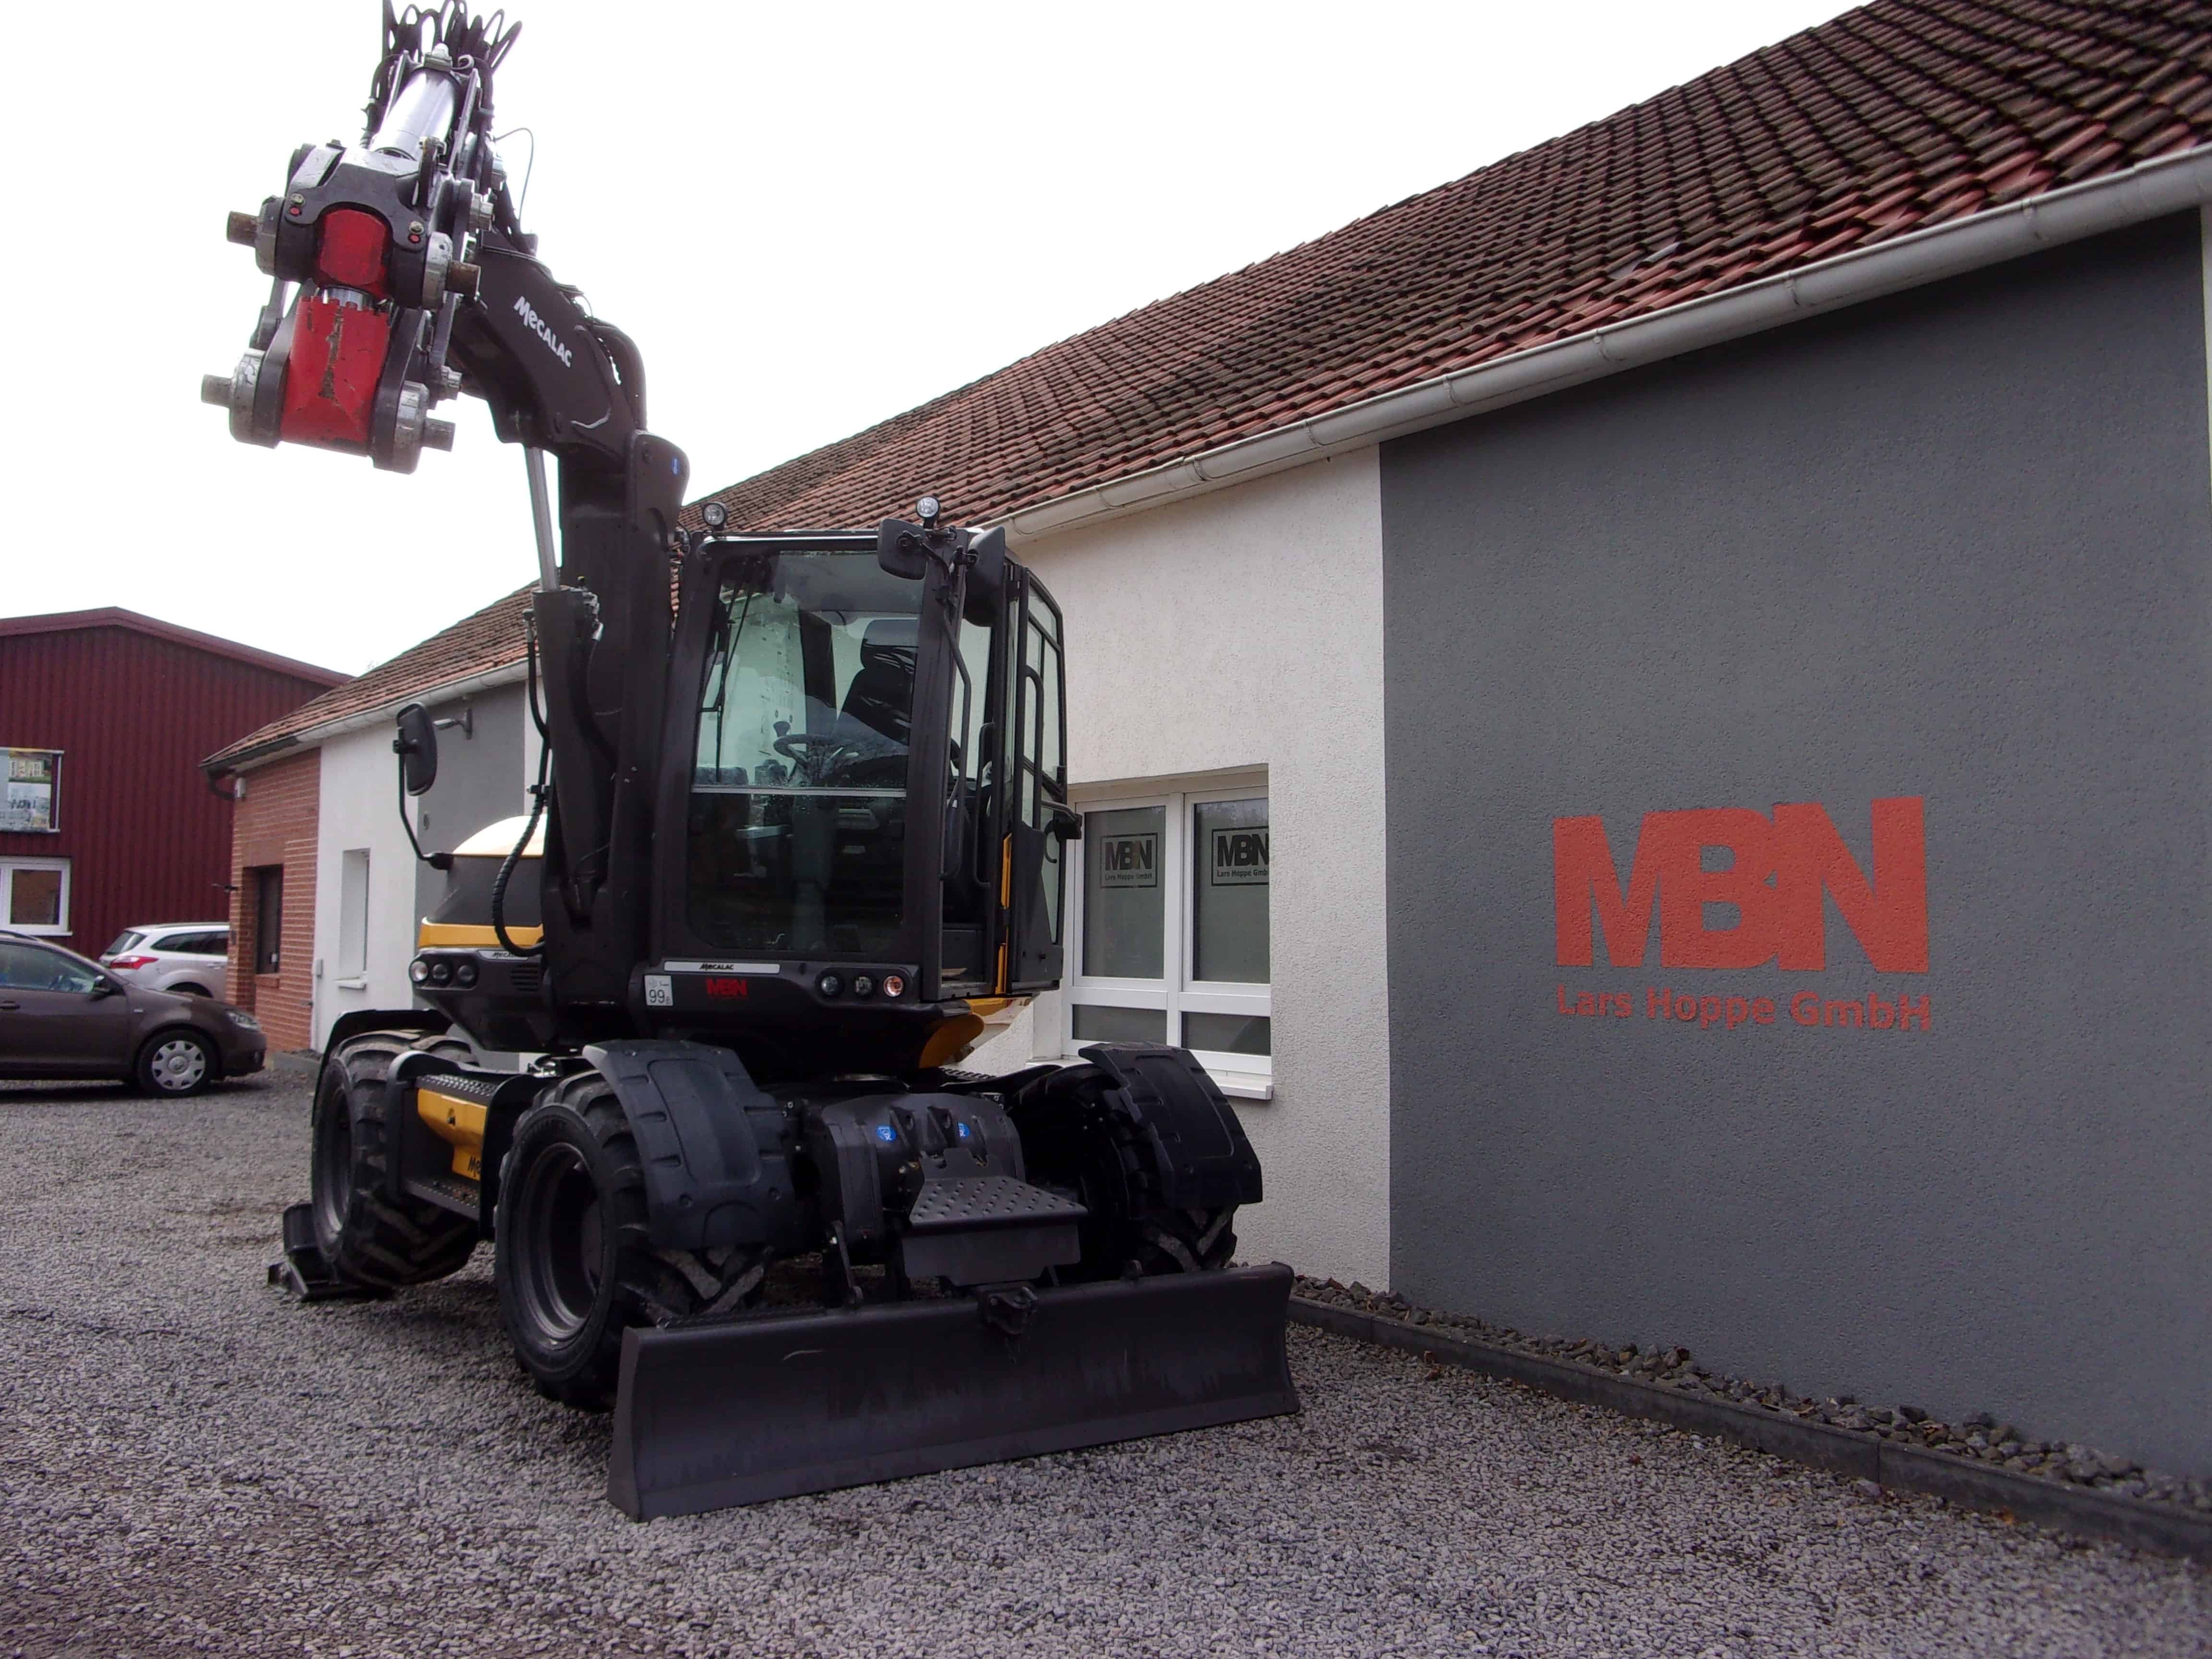 Mecalac-Mobilbagger-9mwr-9-mwr-gebraucht-kaufen-gebrauchtmarkt-mbn-baumaschinen-angebot-verkaufen